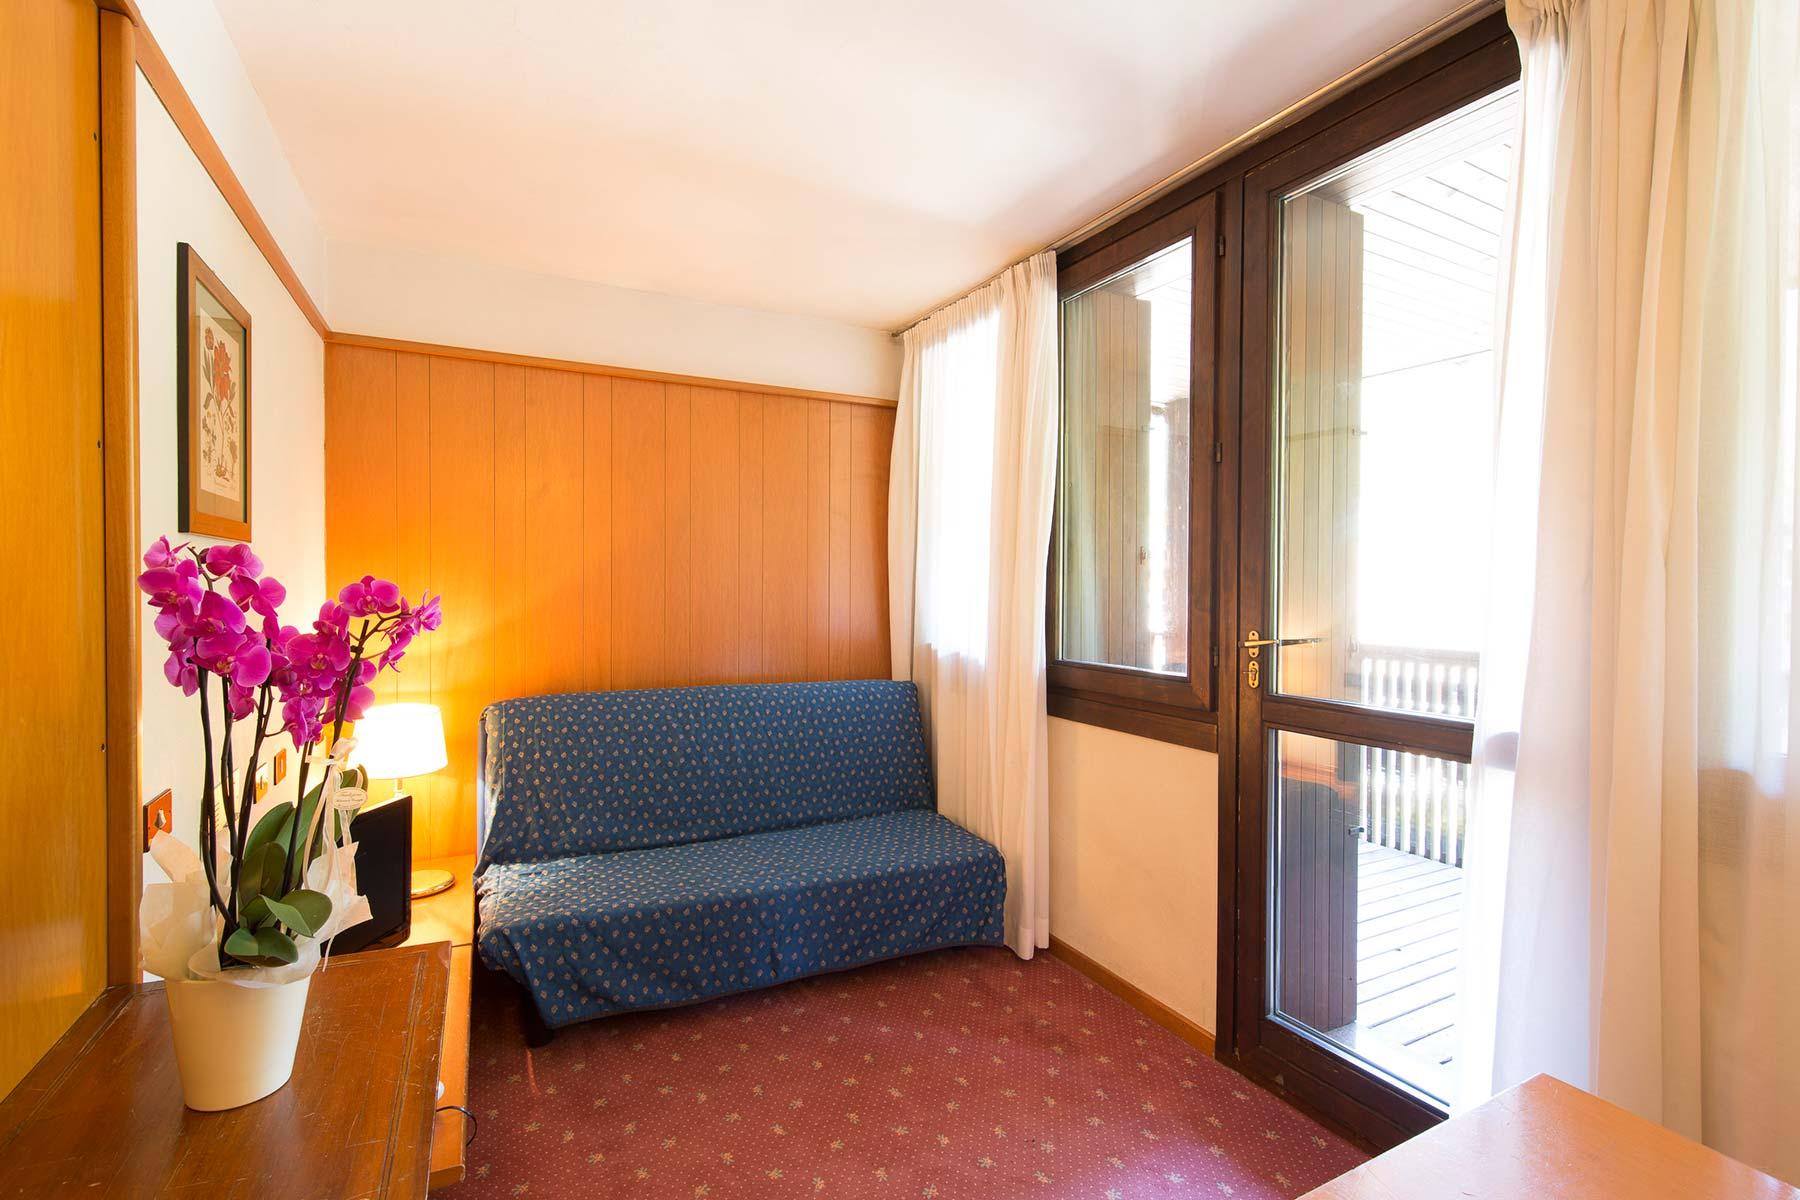 Picture of: Hotel Des Alpes 2 Studio Apartment 2 Beds Collini Gestioni